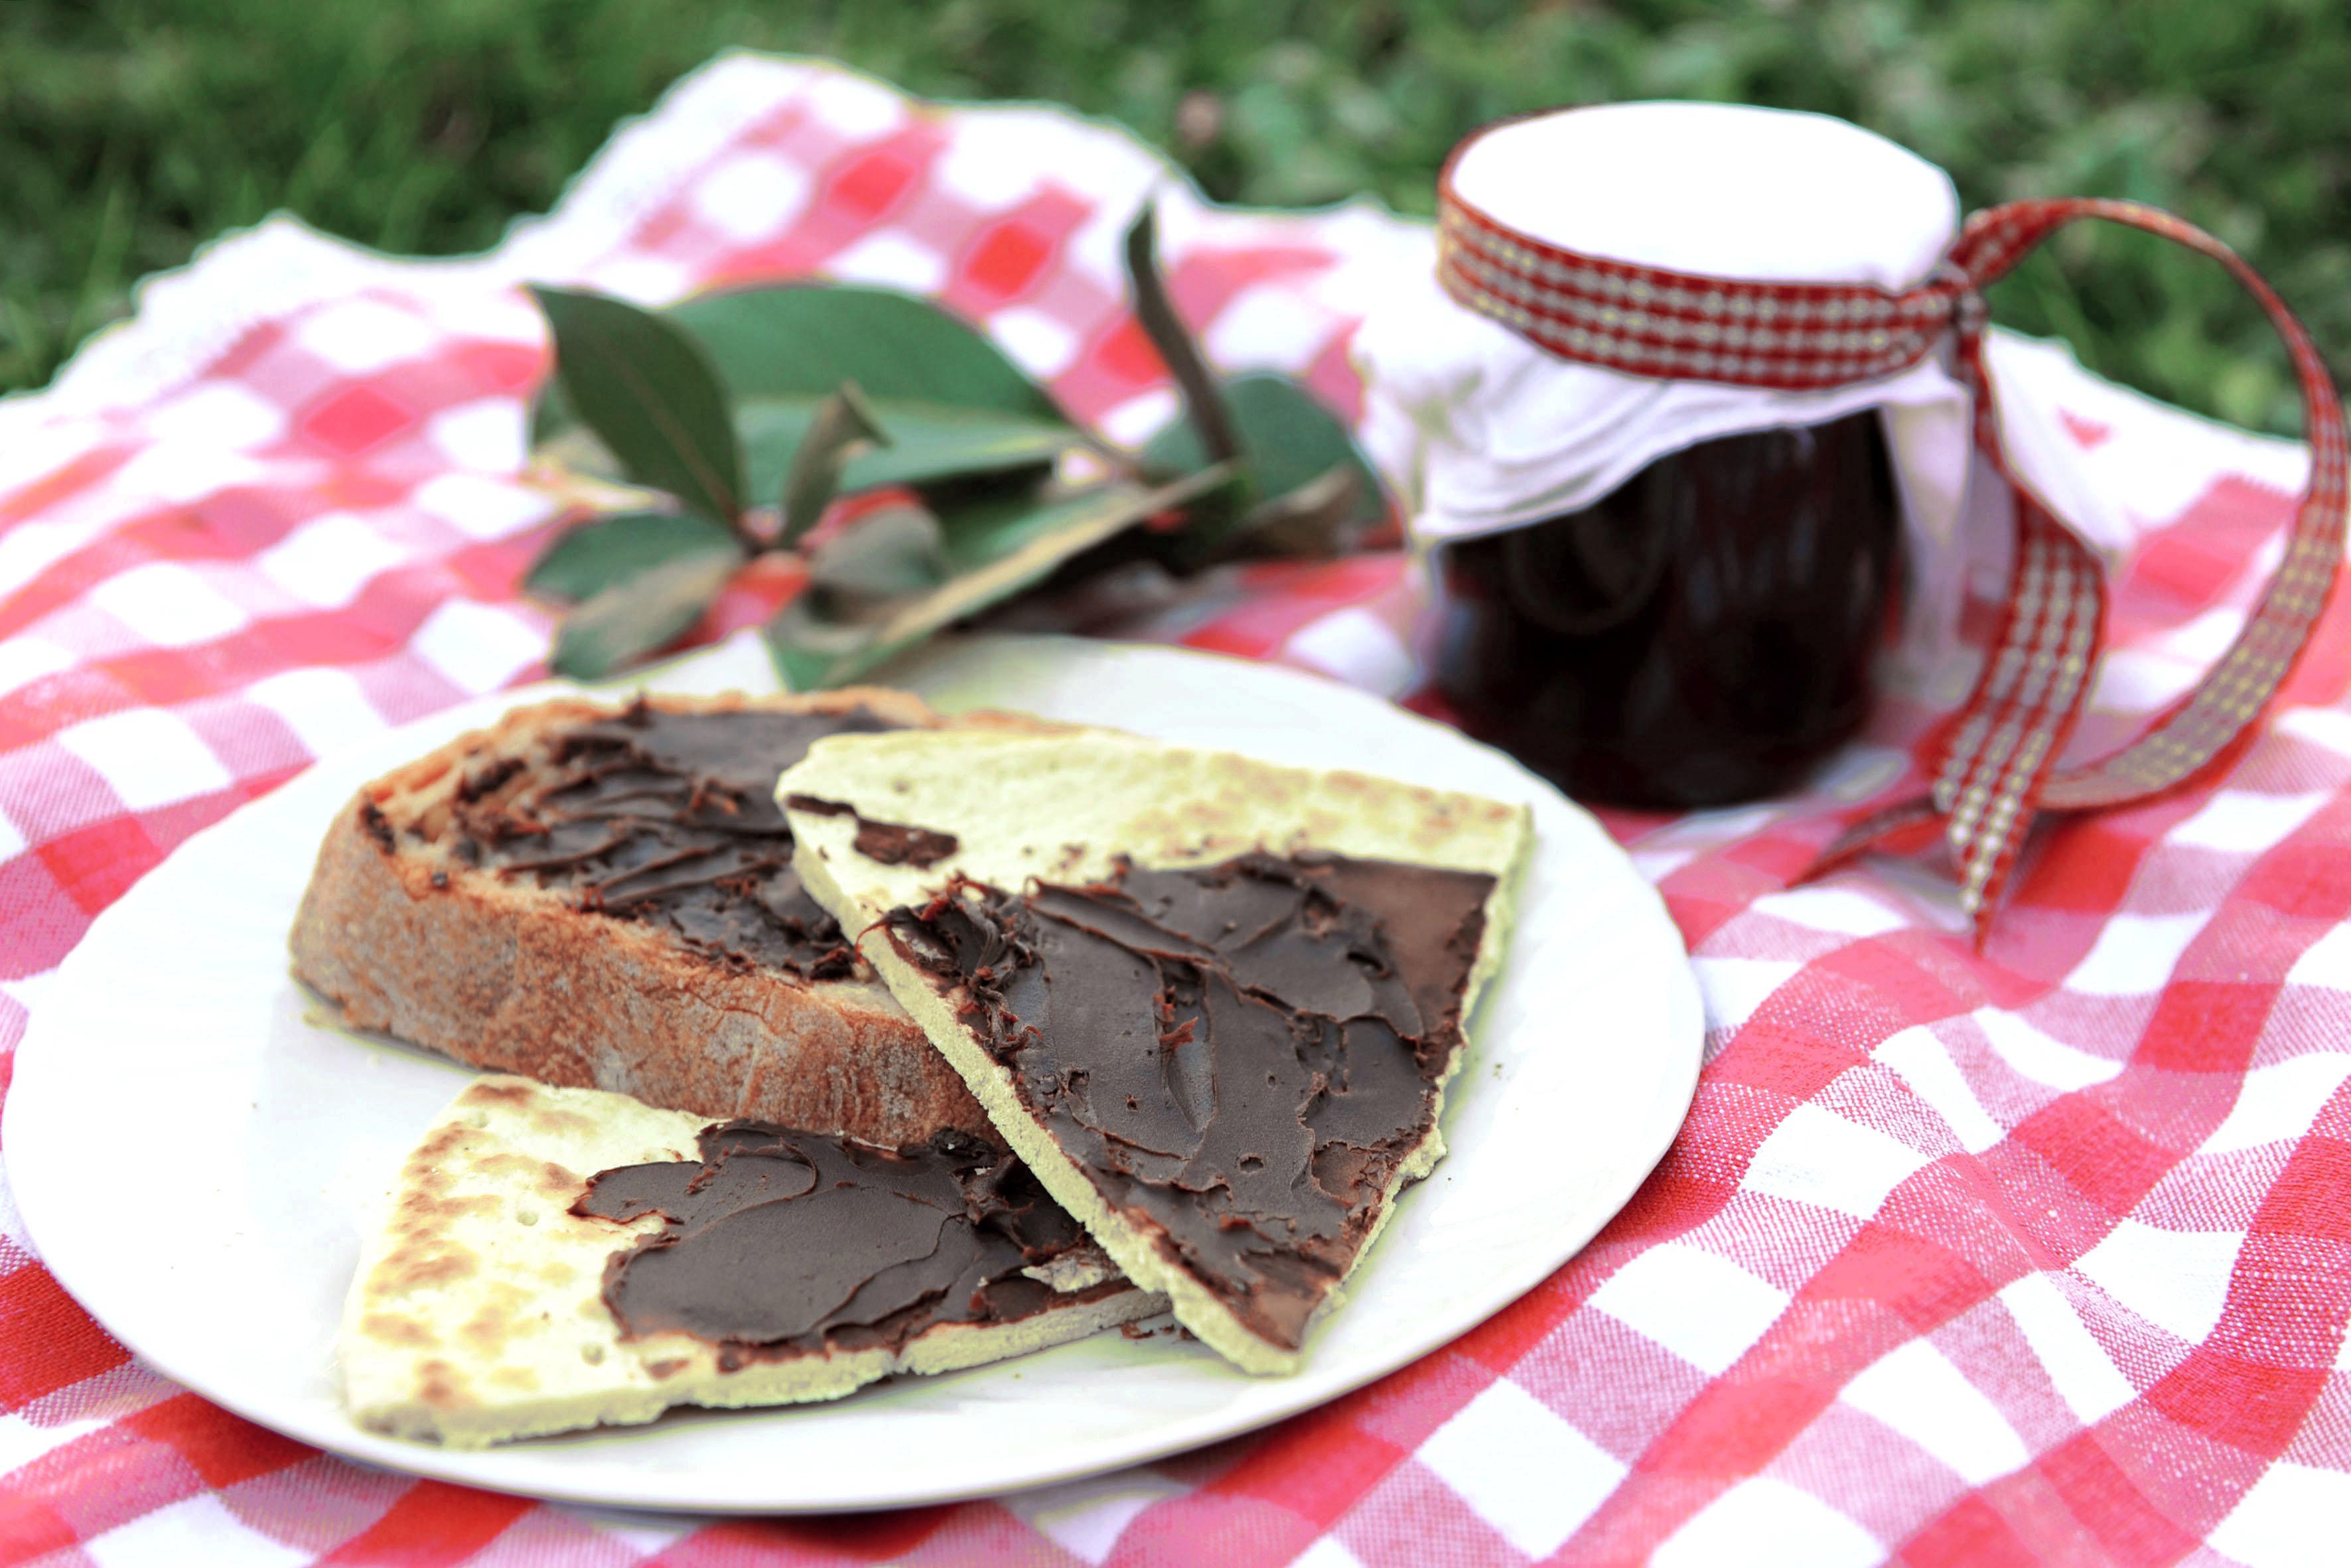 Crema cioccocaffè